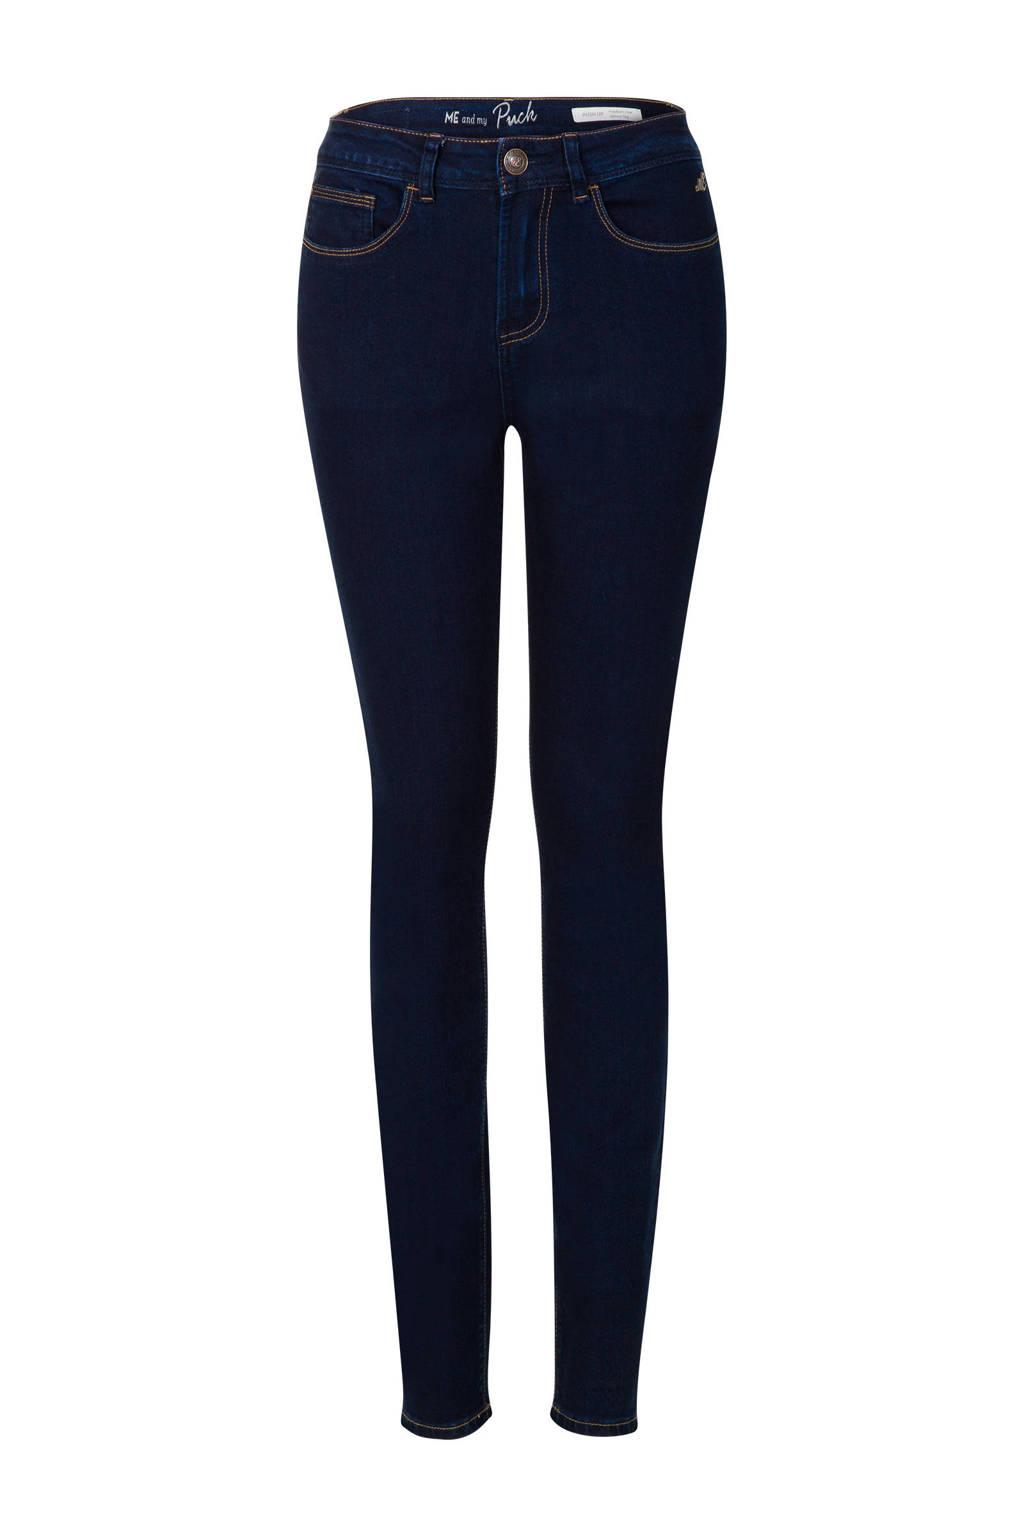 Miss Etam Regulier skinny jeans Puck 32 inch, Donkerblauw